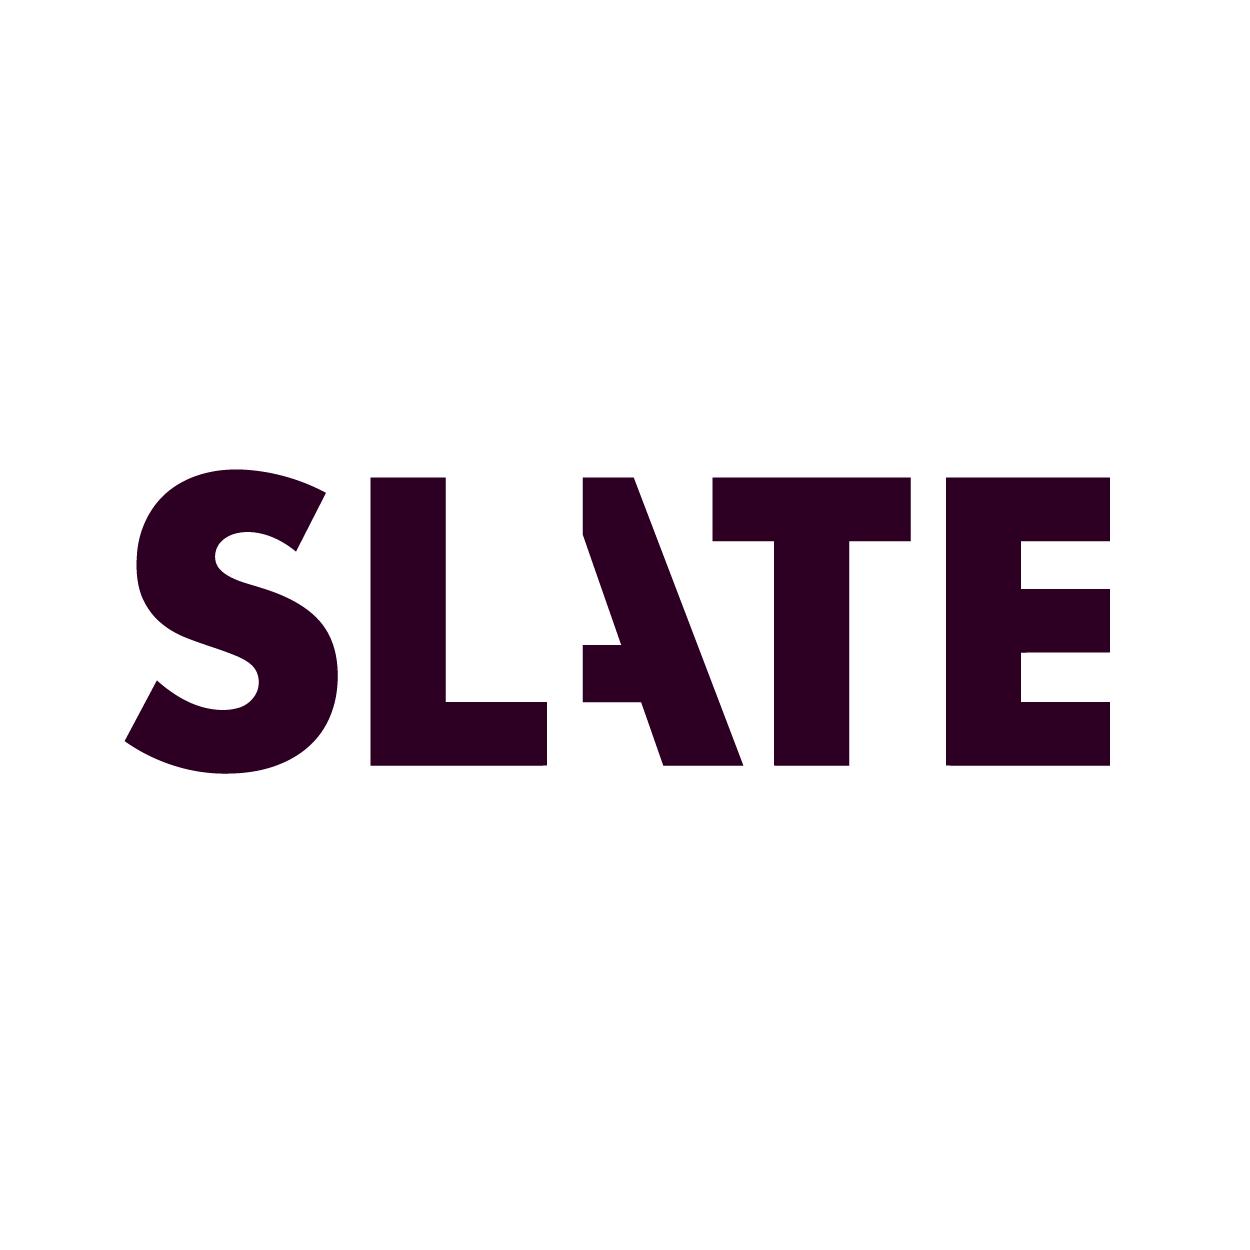 Slate article